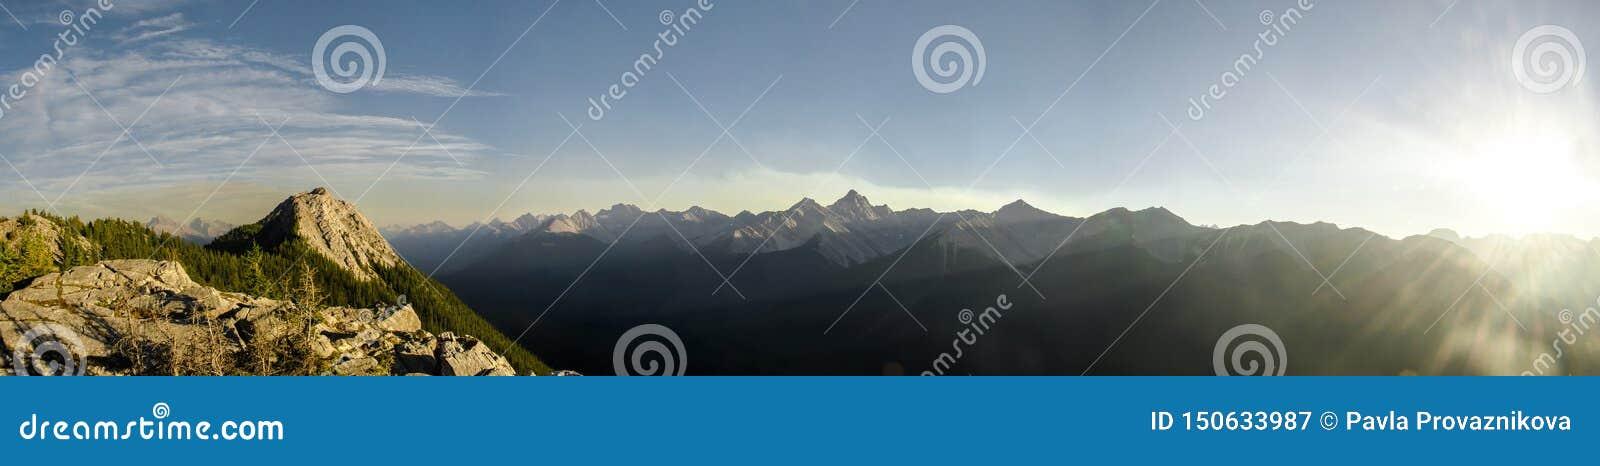 Neverending mountain range next to the Banff Gondola in the Rocky Mountains